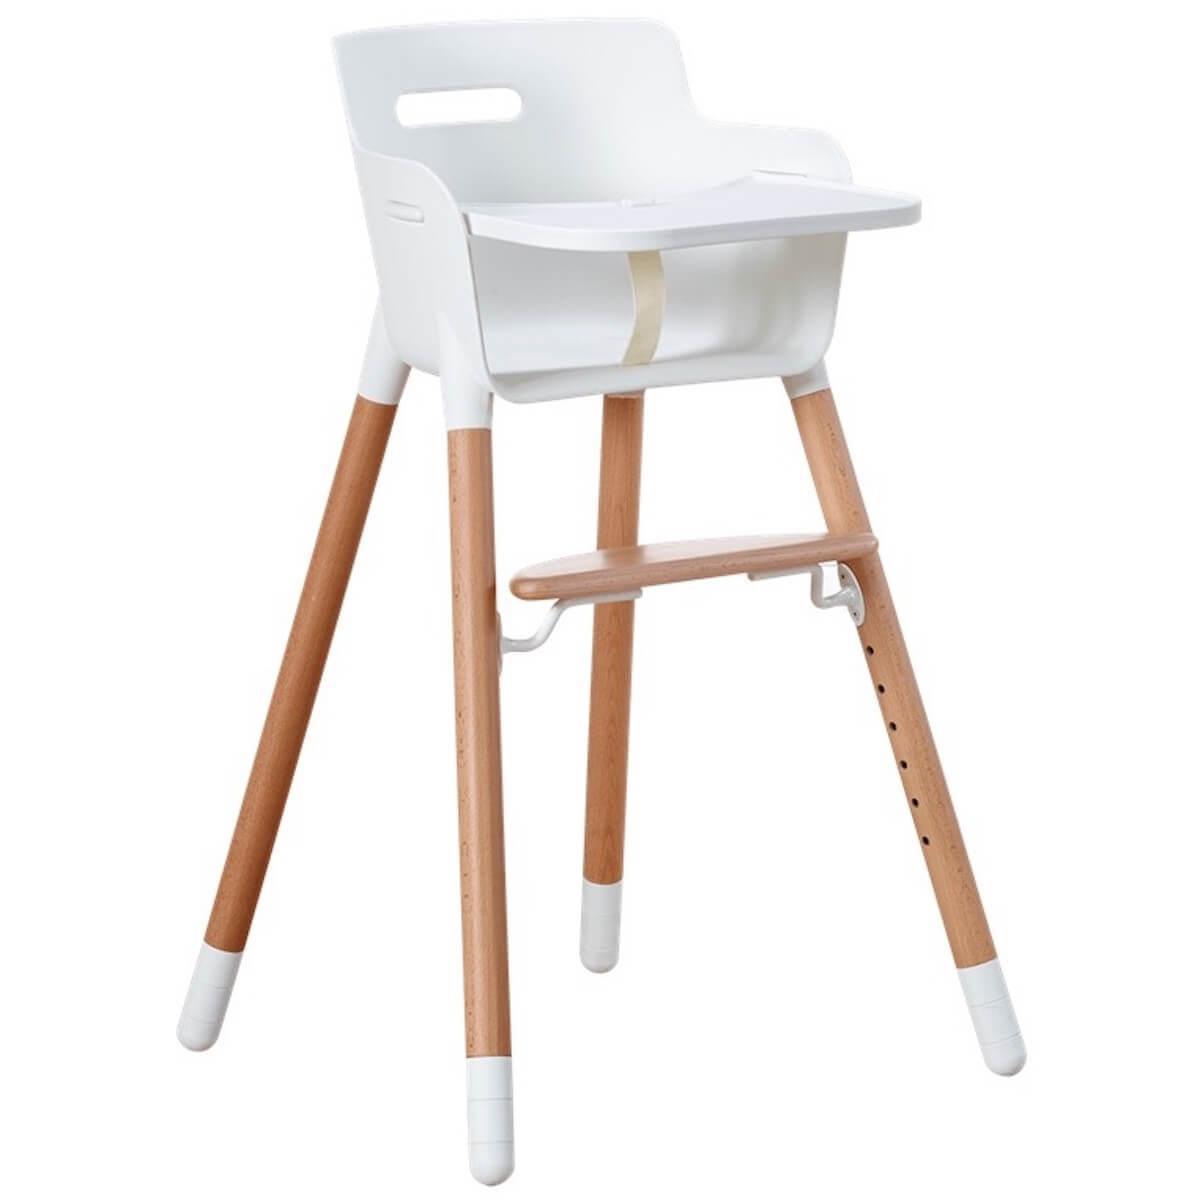 Chaise haute tablette BABY Flexa naturel-blanc